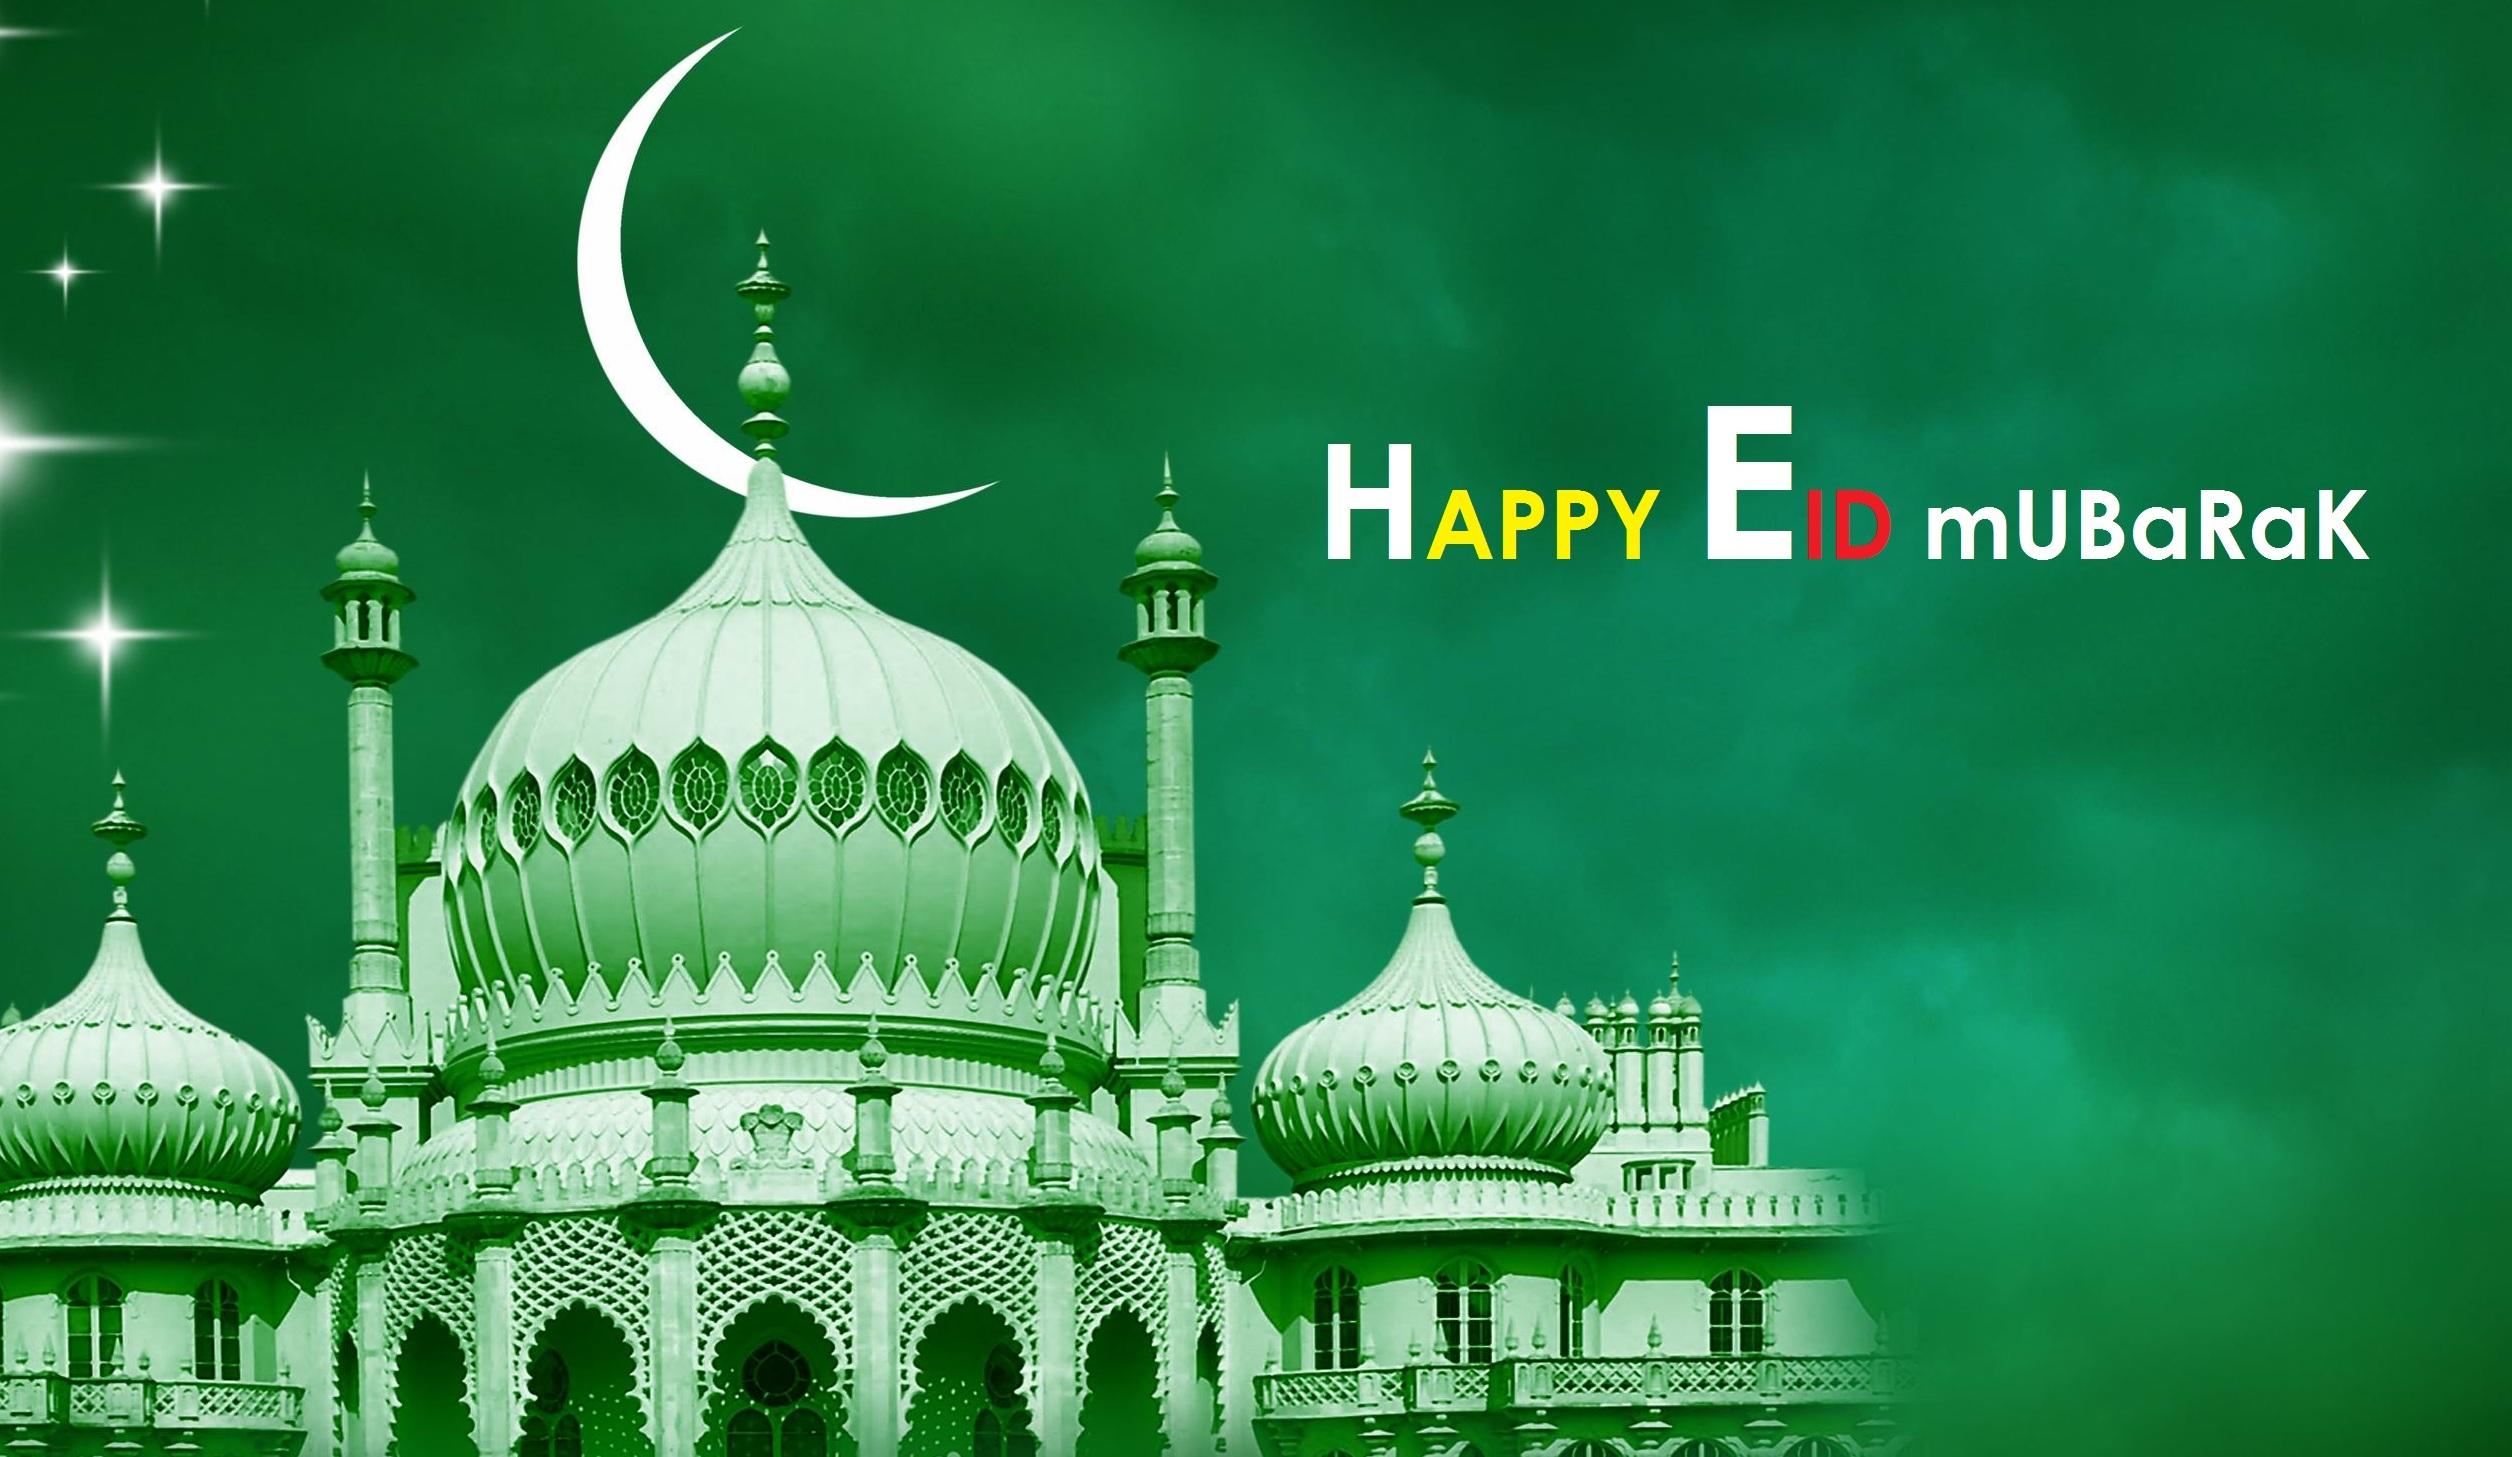 Love Eid Mubarak Wallpaper : Eid Mubarak - Greetings Wallpapers - XciteFun.net